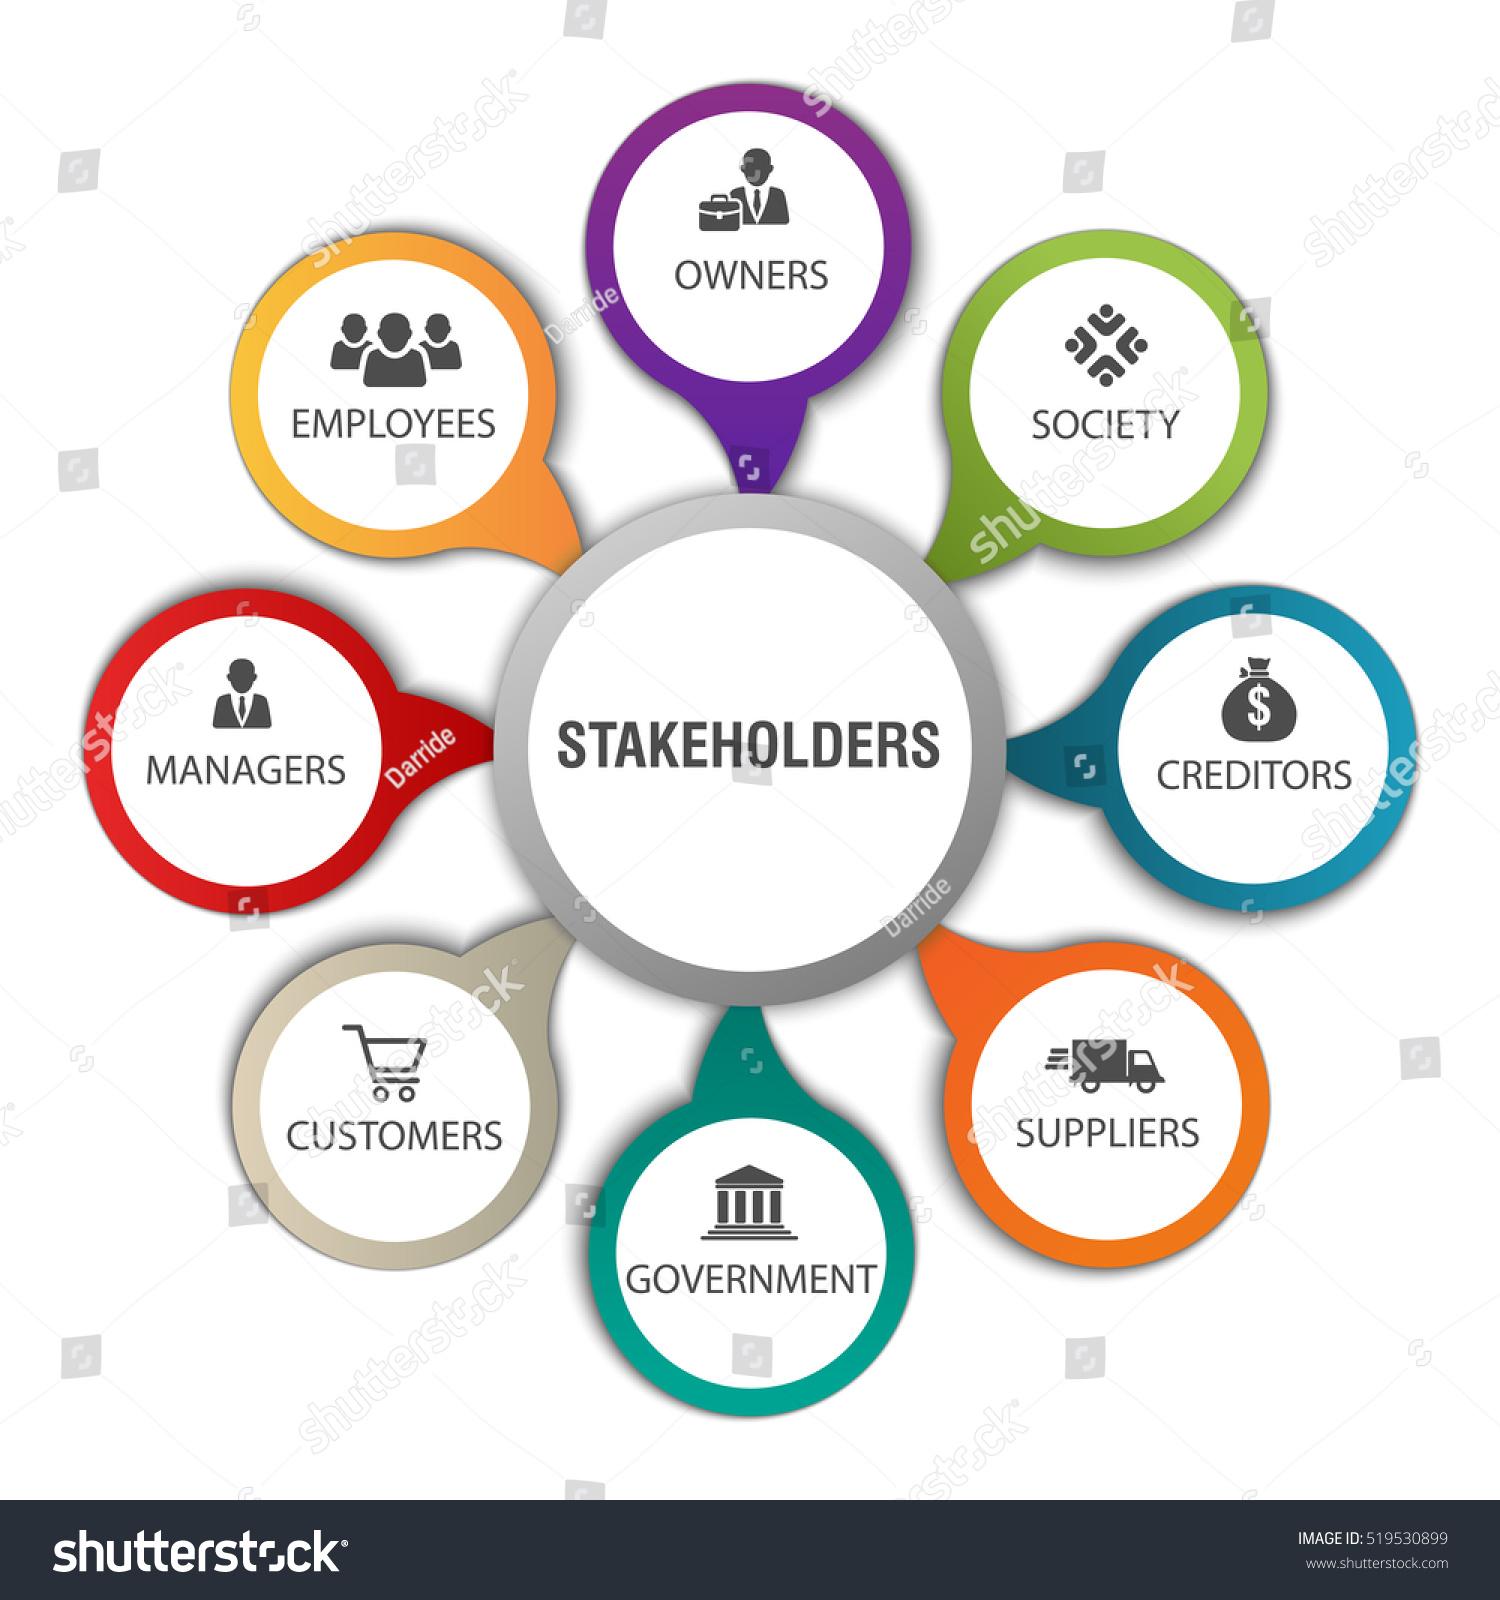 Vector infographics chart depicting various stakeholders stock vector infographics chart depicting various stakeholders for organization with symbols buycottarizona